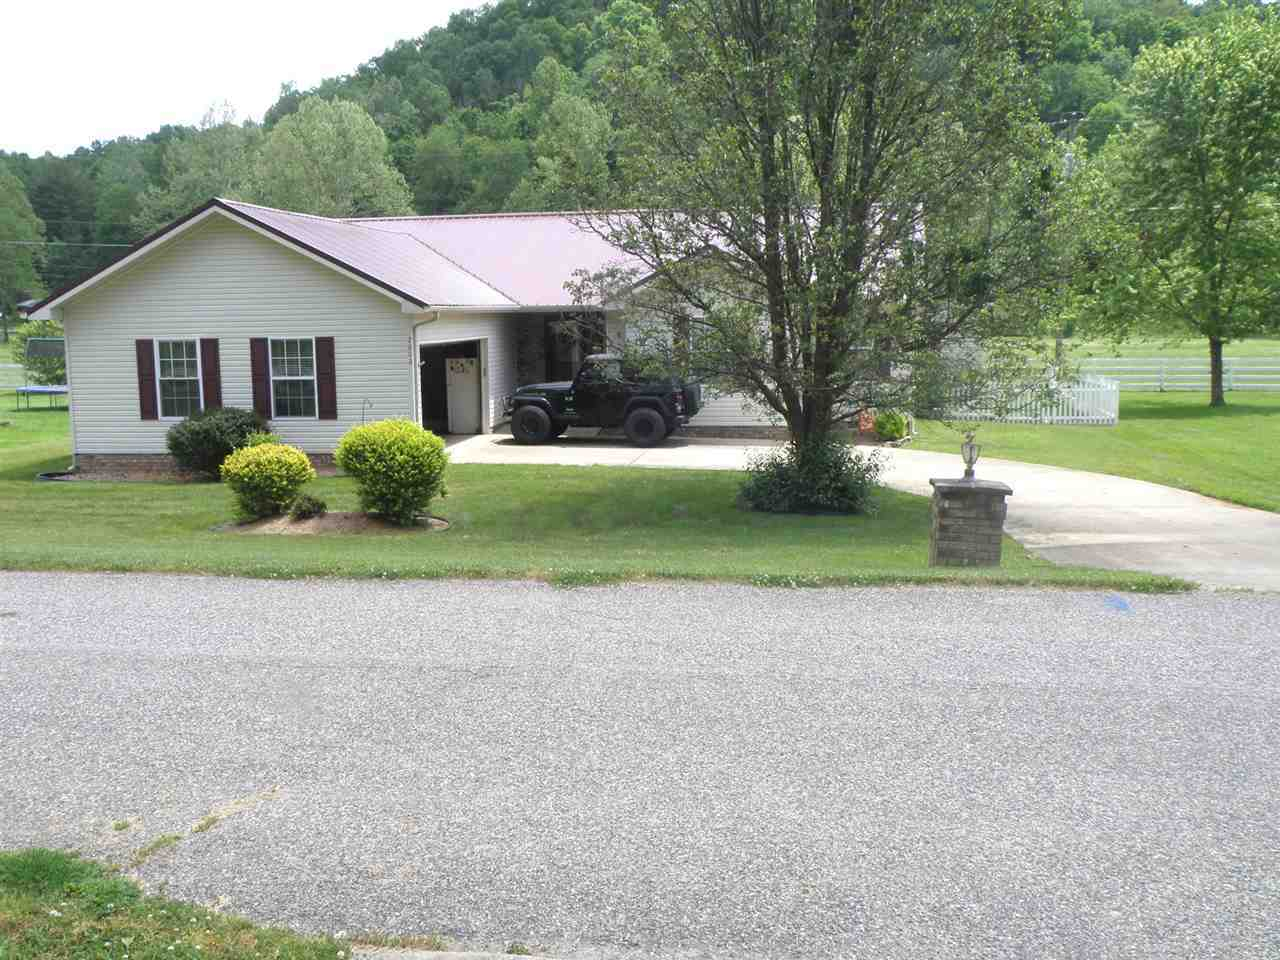 2602 oak hill lane ashland ky mls 49512 ashland ky homes for sale